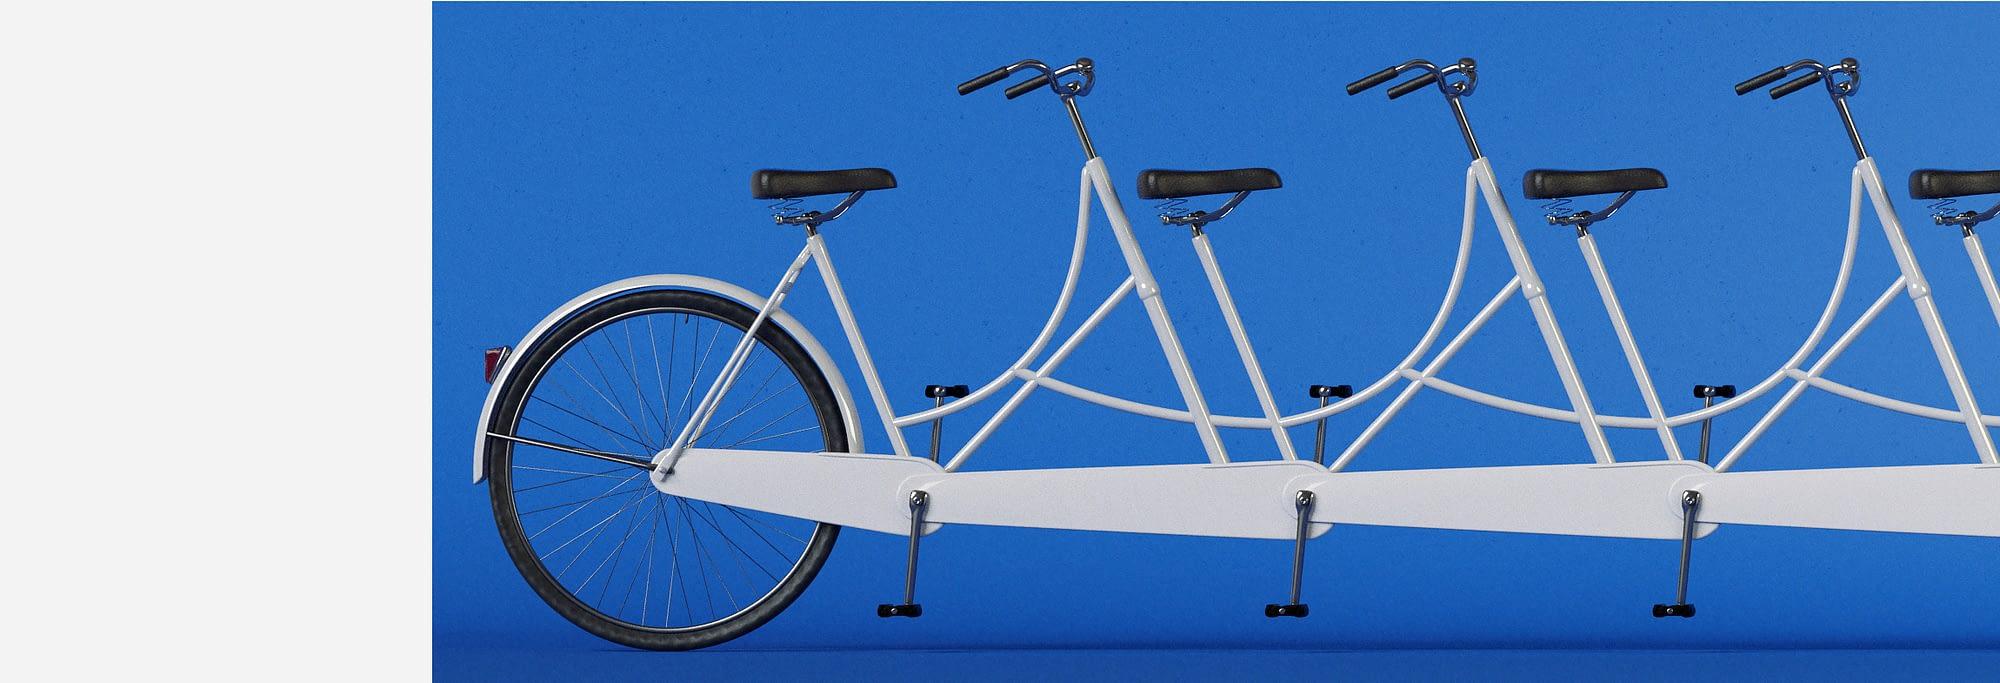 Ocean-Bike-01